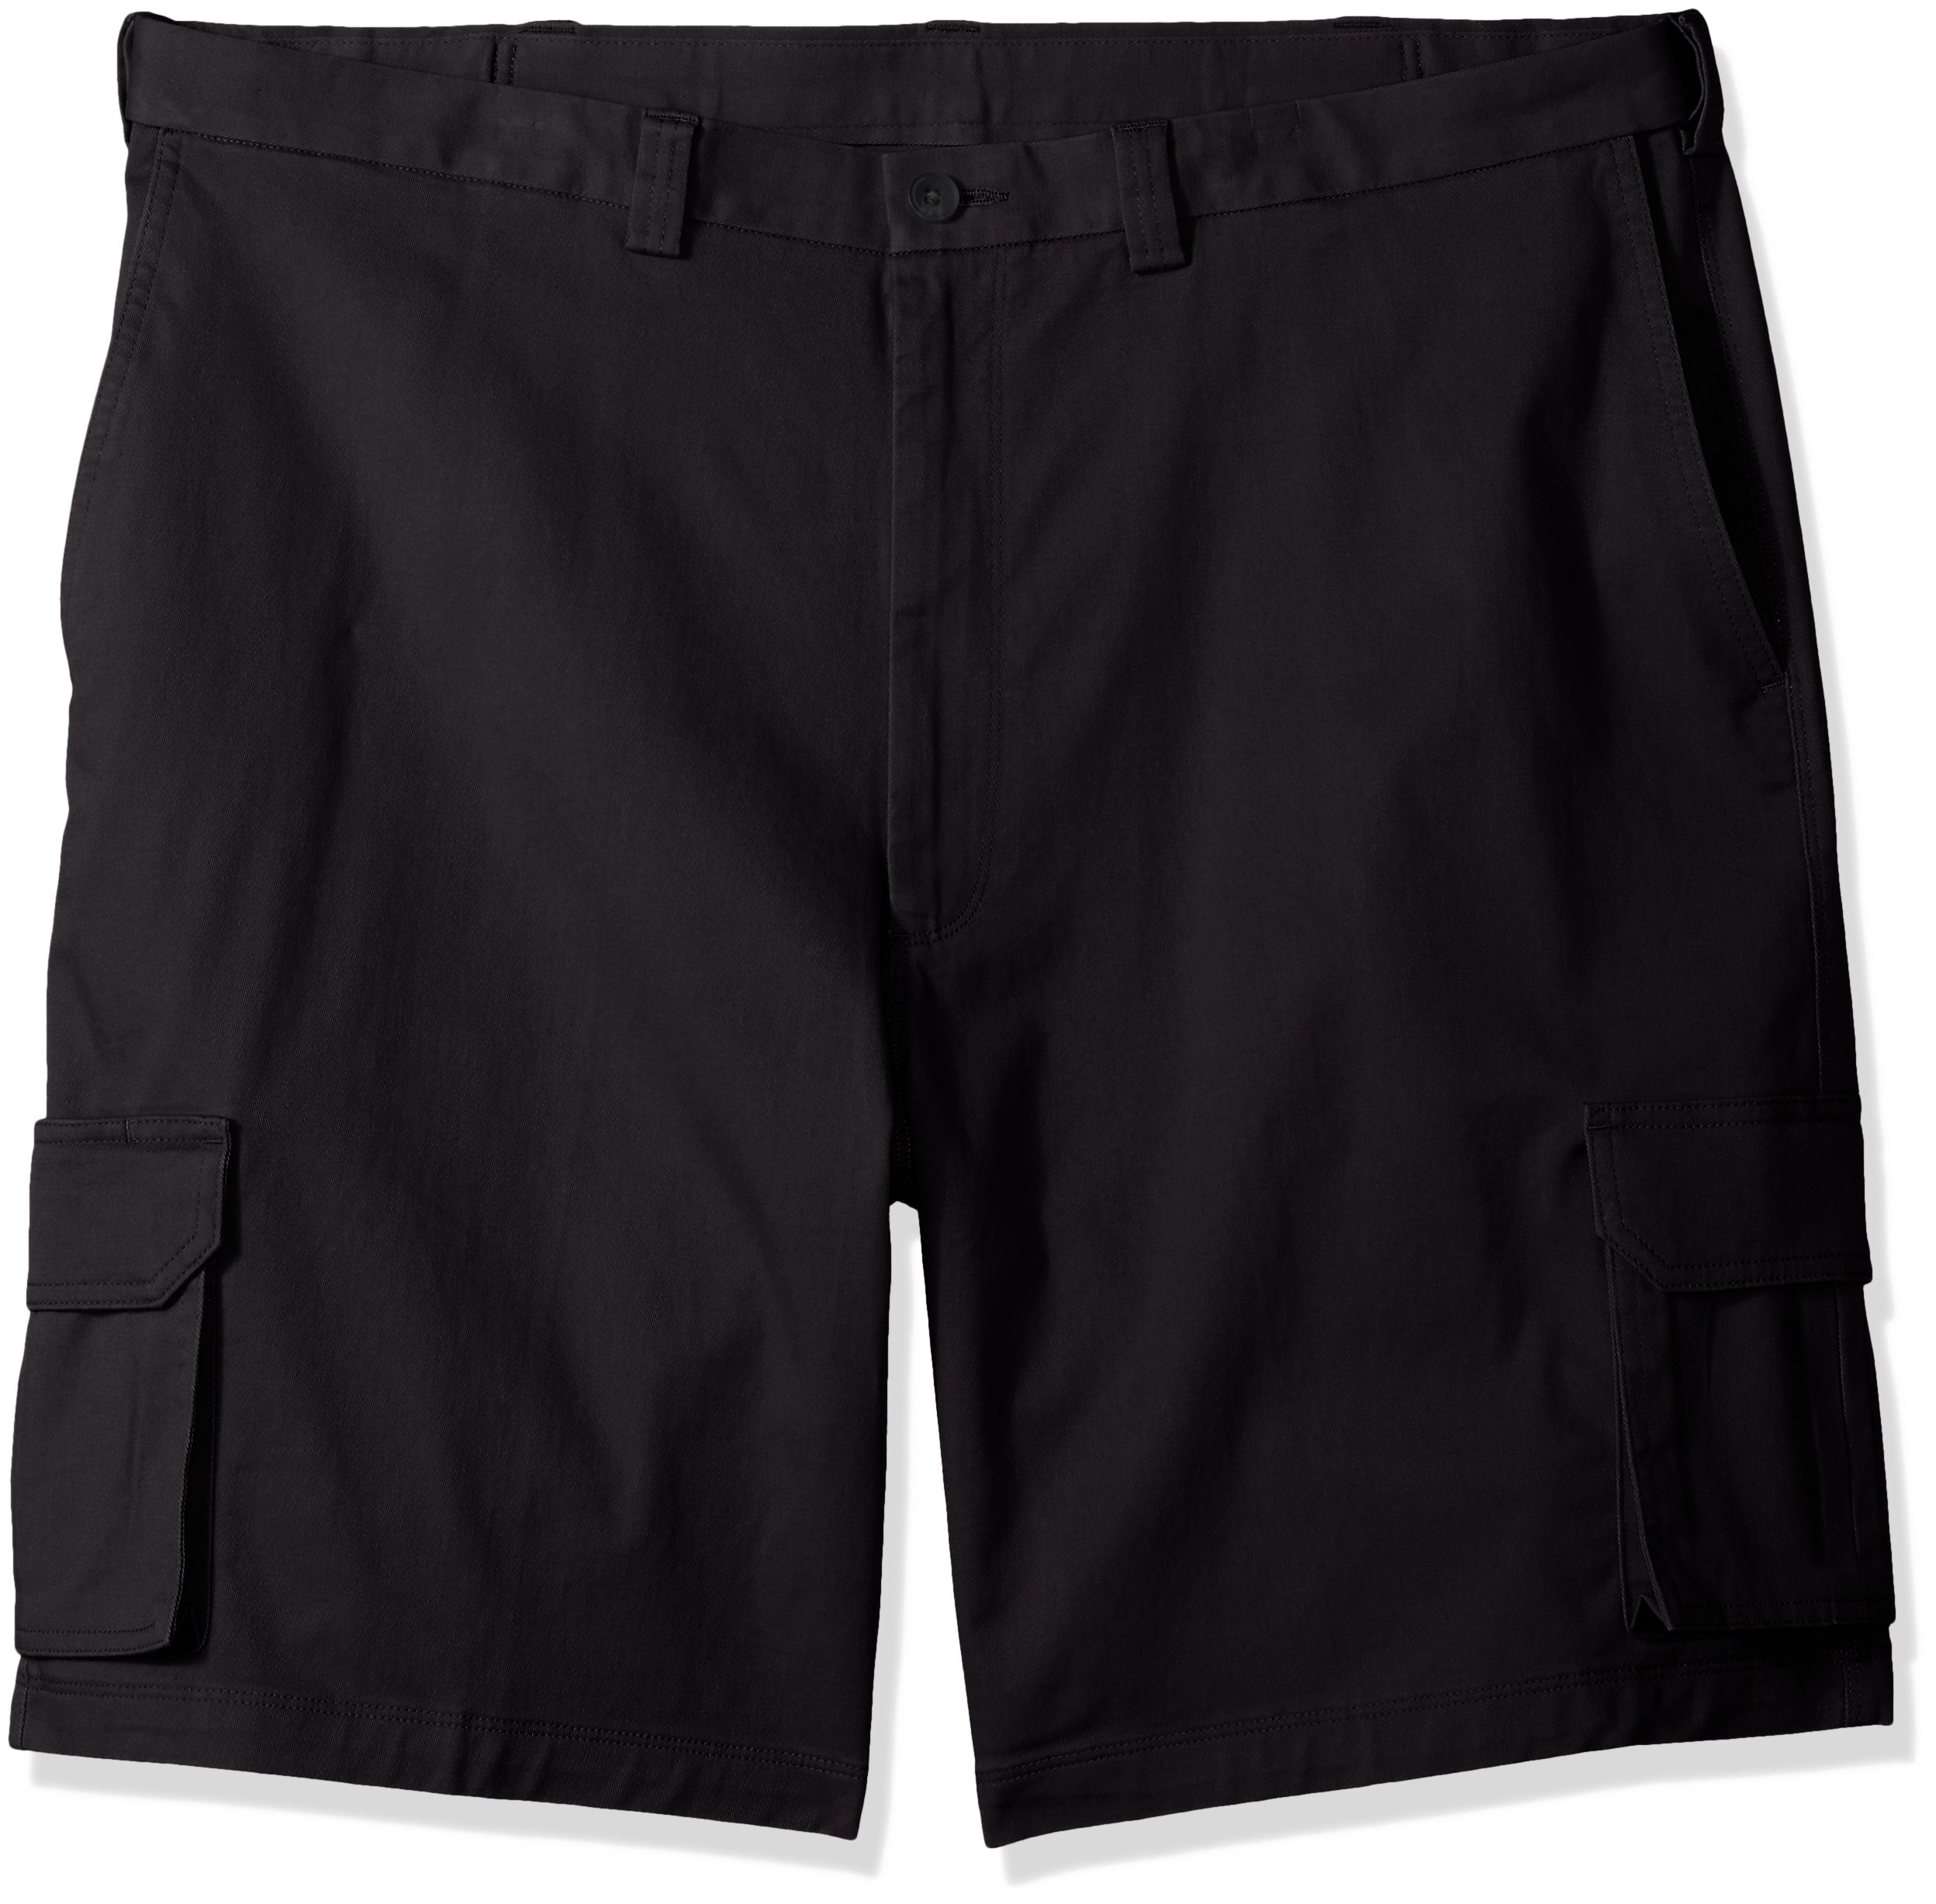 Haggar Men's Big and Tall Stretch Comfort Cargo Flat Front Short, Black 54